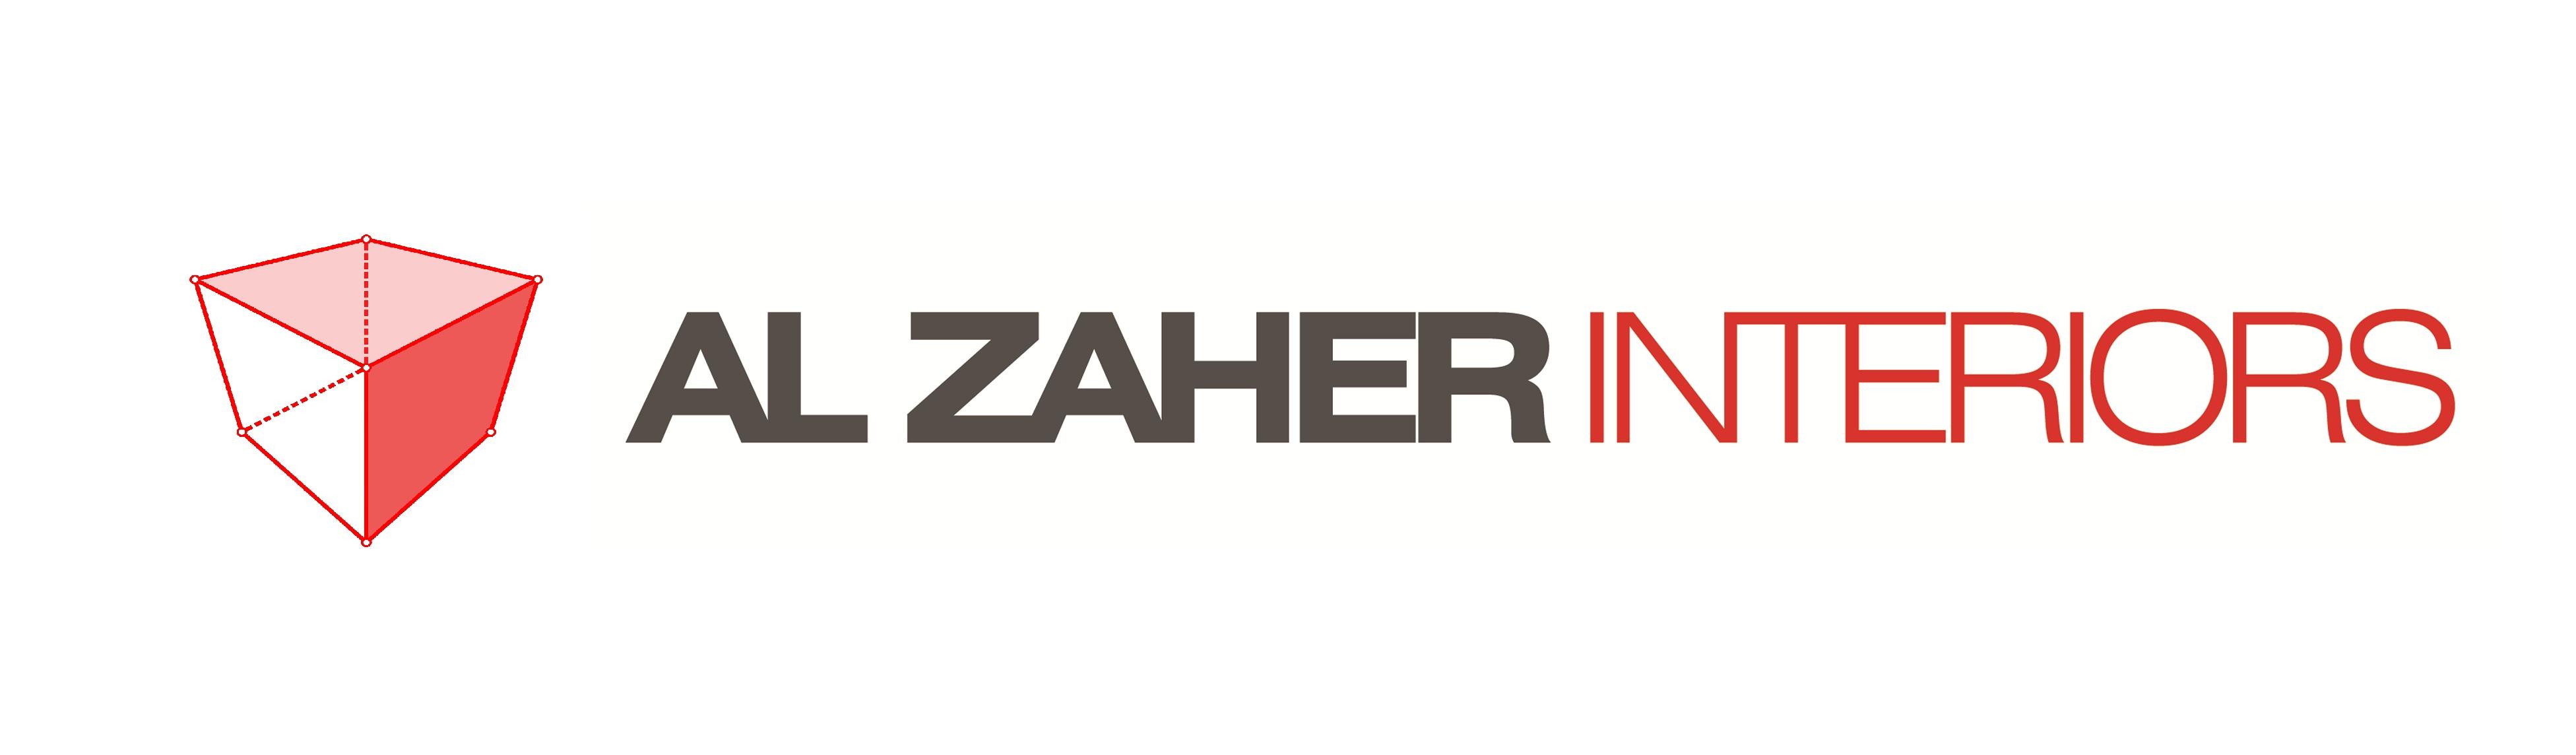 Al Zaher Interiors